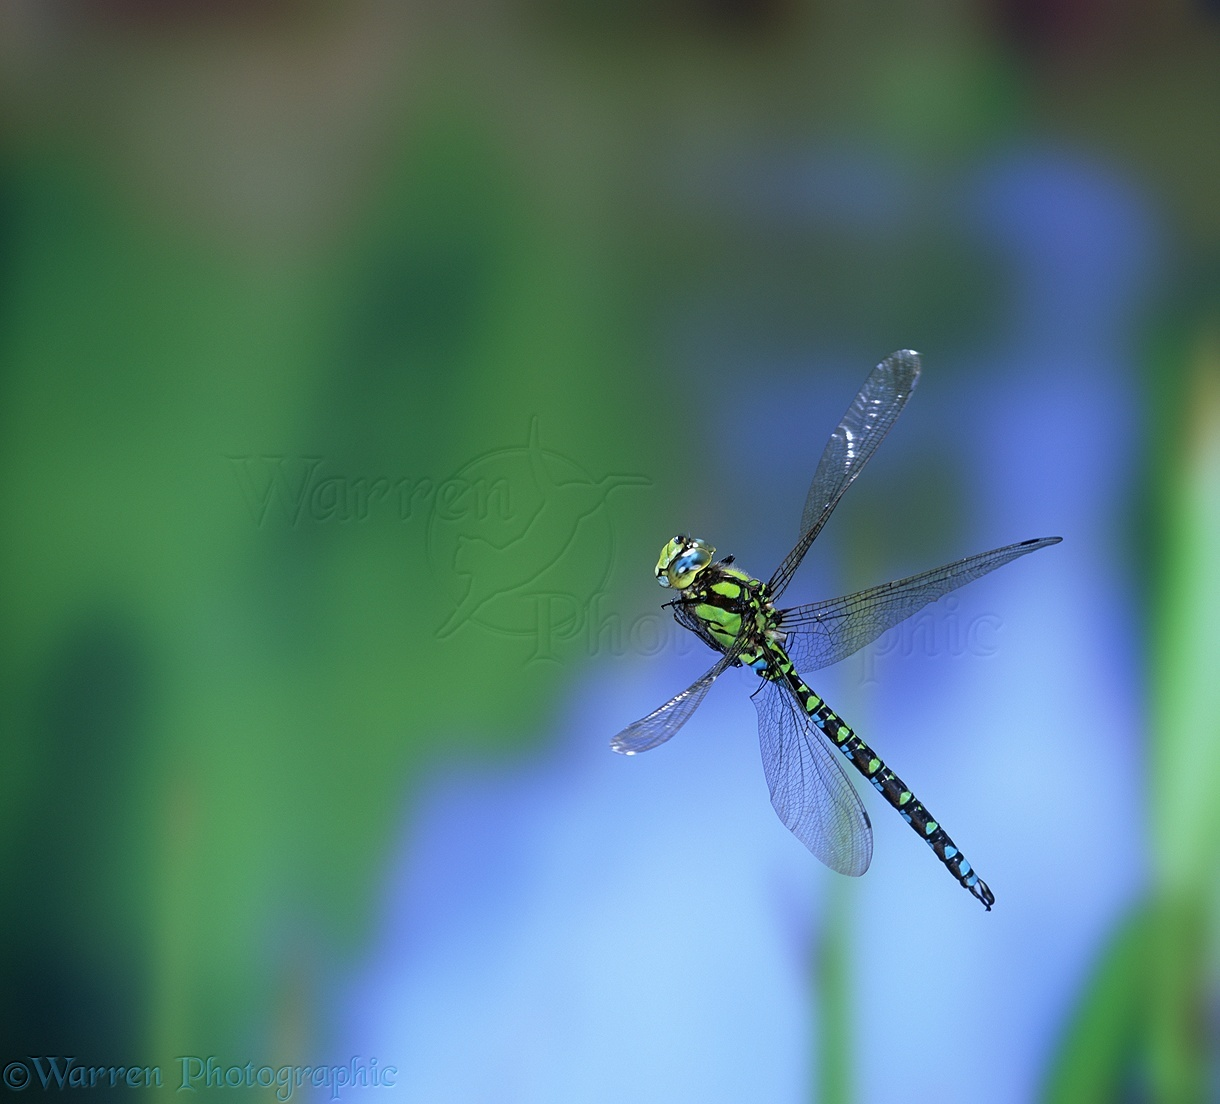 Southern Aeshna Dragonfly photo - WP04422 Bee